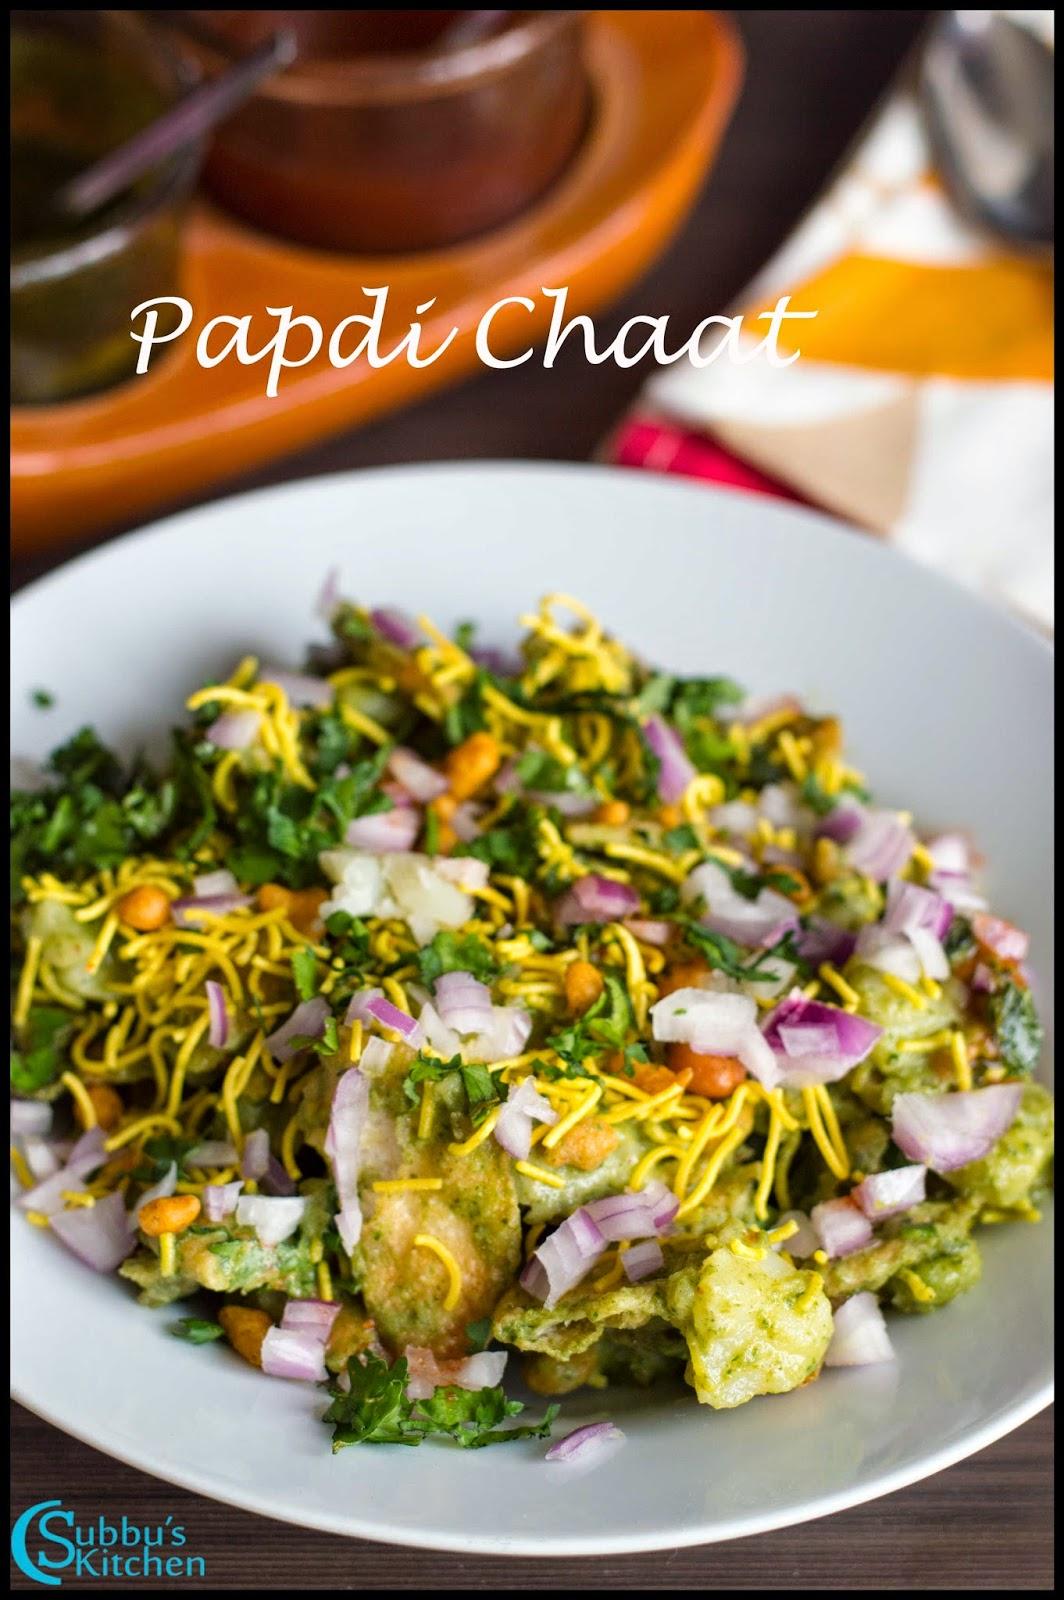 Dahi Papdi Chaat Recipe | How to make Dahi Papdi Chaat